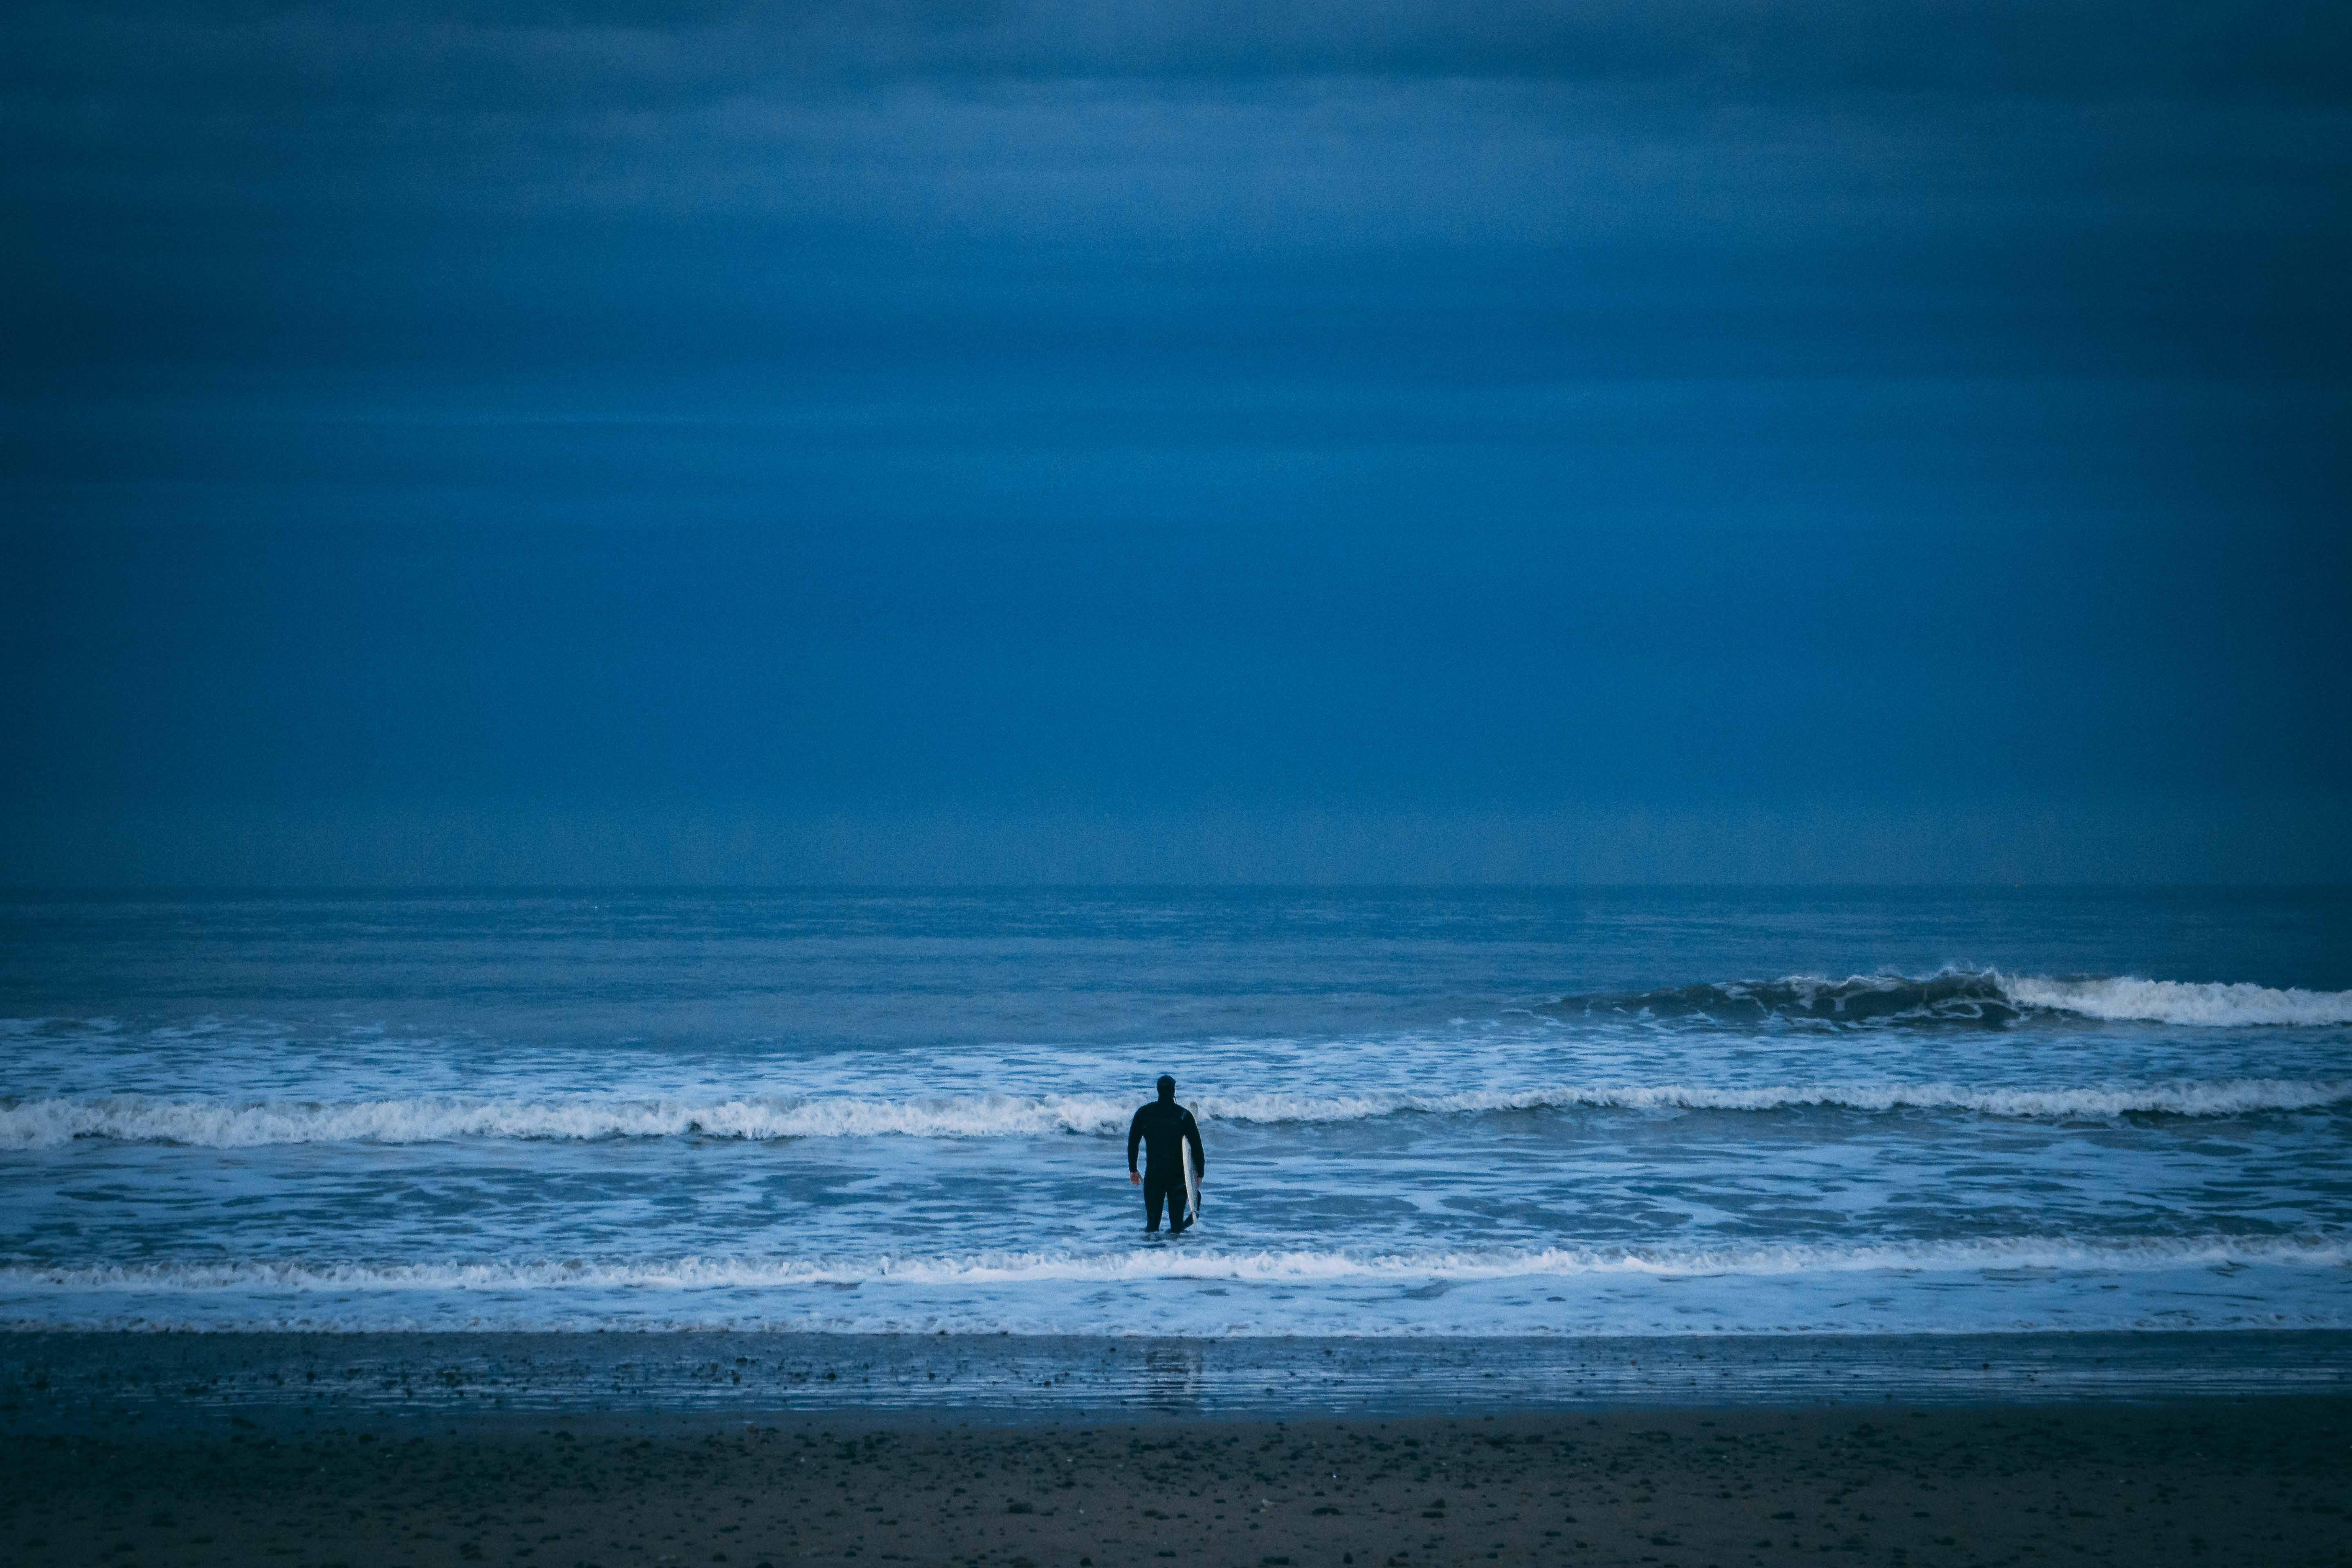 man standing on beach under cloudy sky